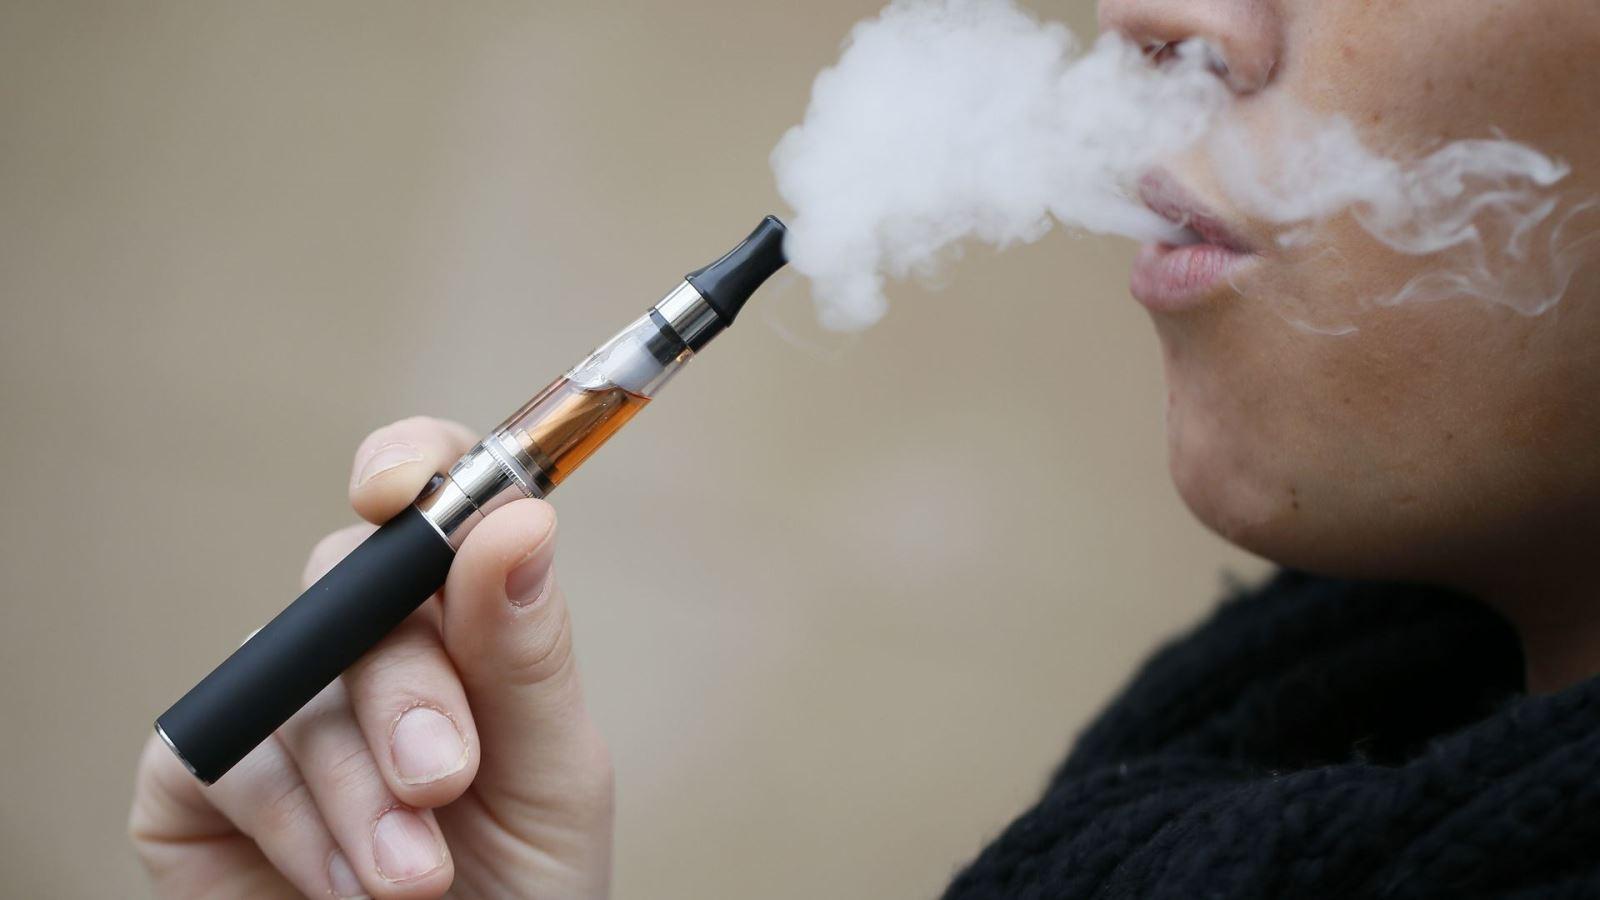 E-Cigarette Use Among Youth in North Carolina